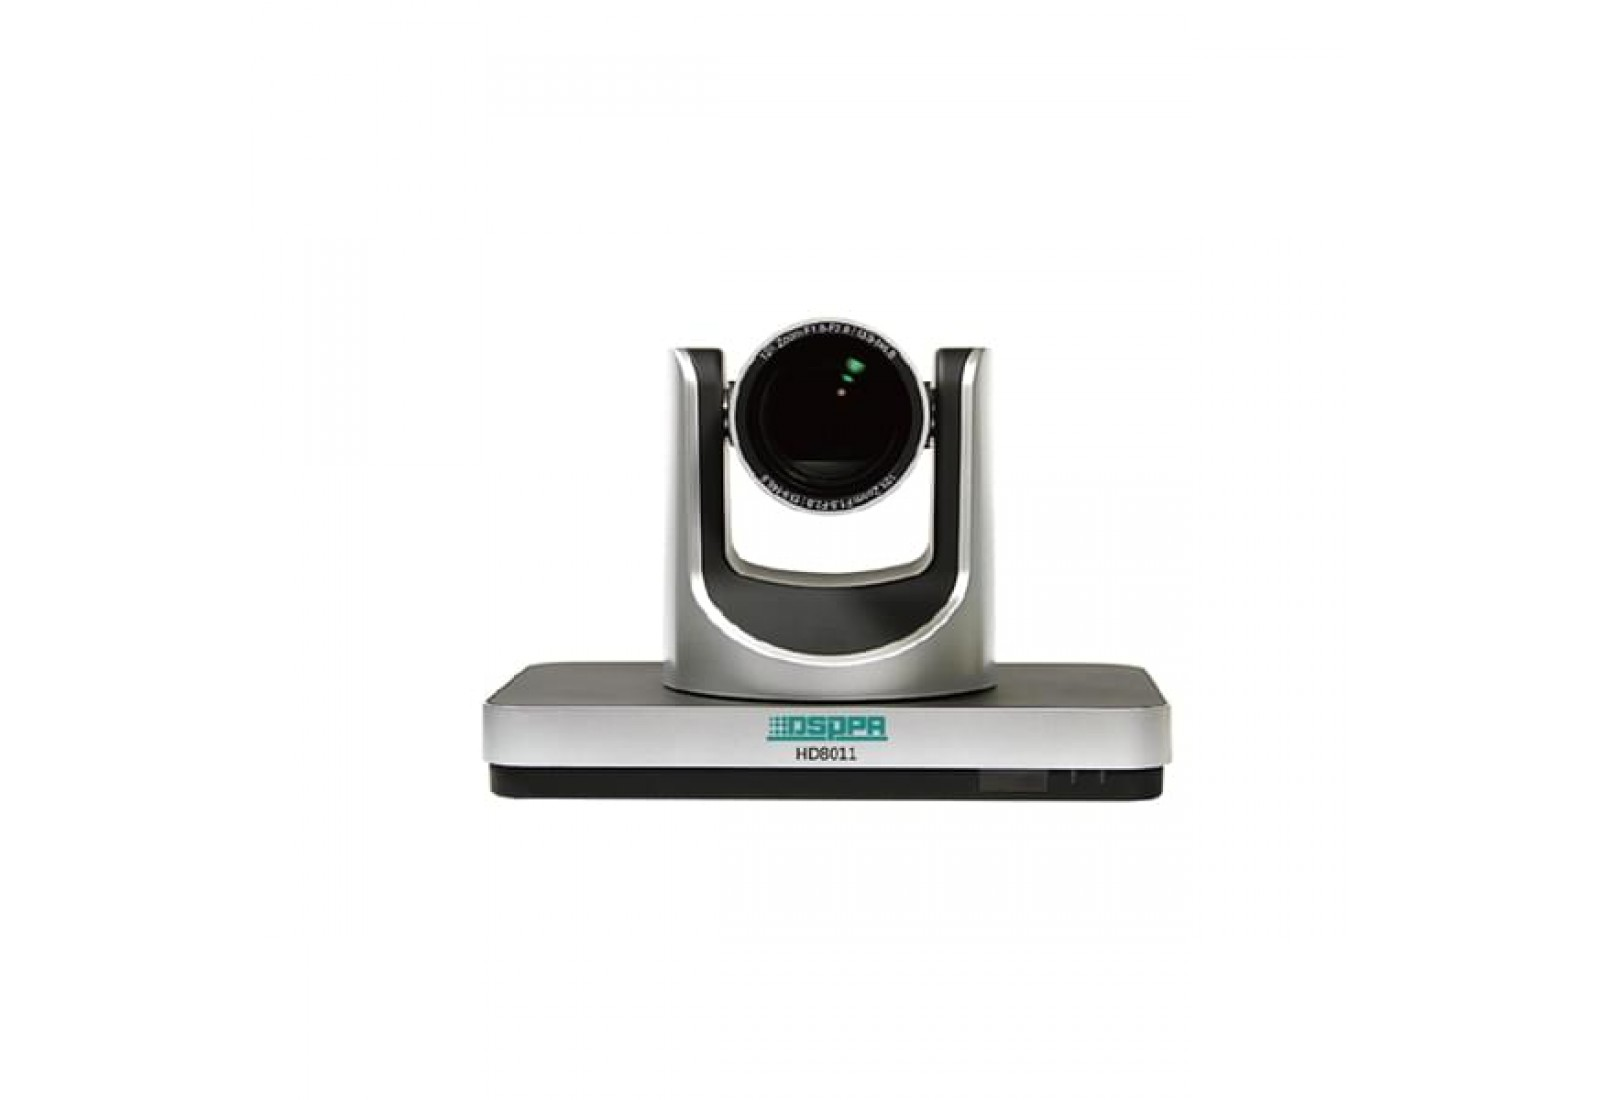 Camera HD8011